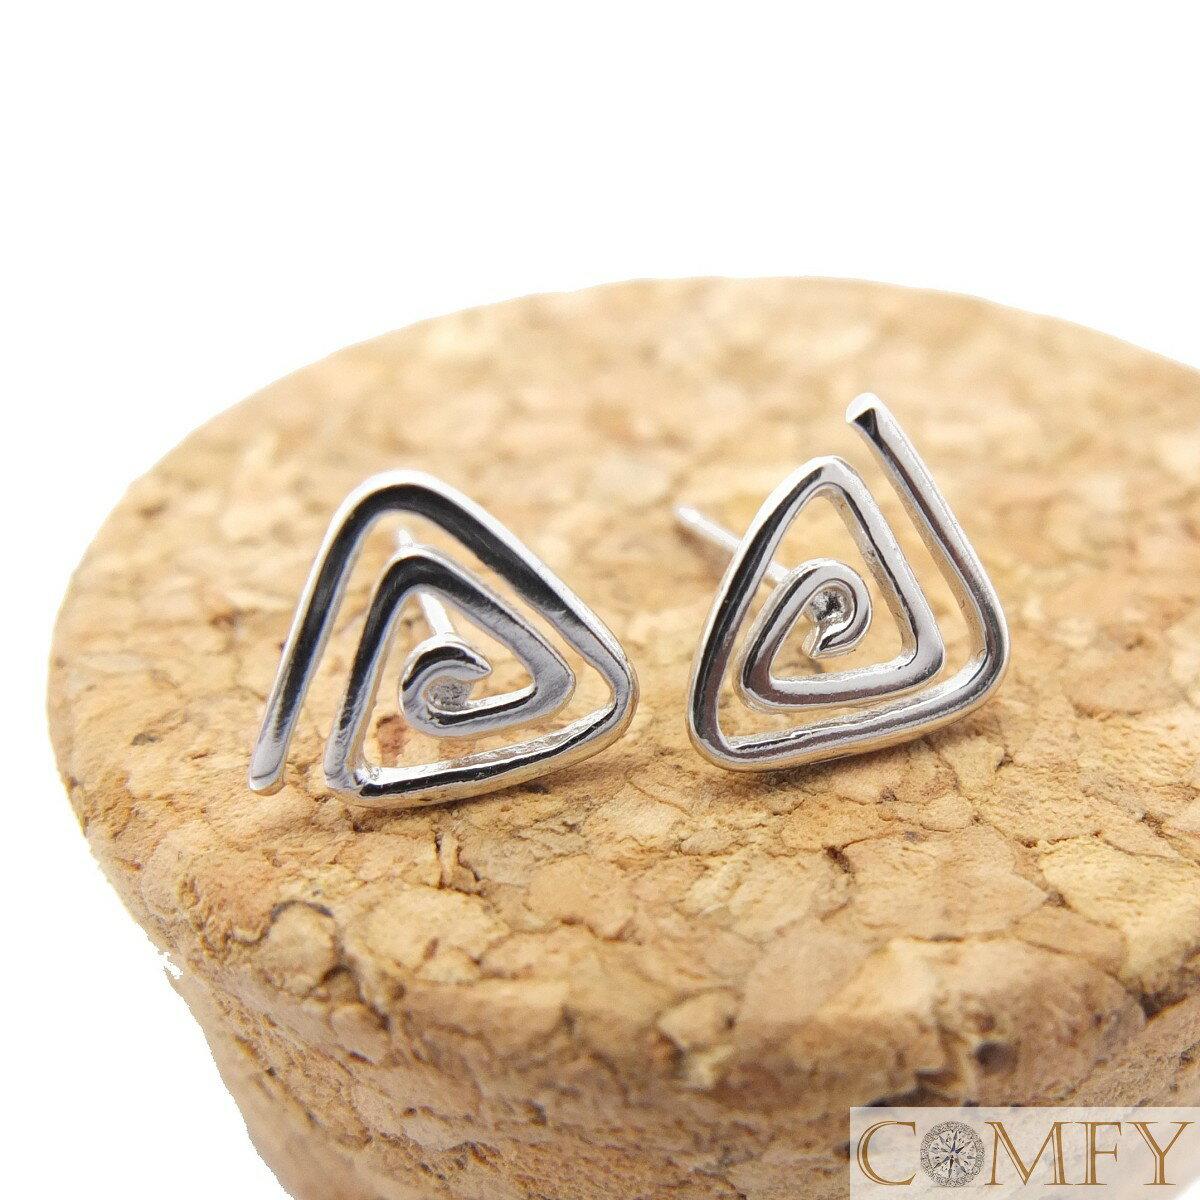 【Comfy禾米】~標記美好*回憶指針~ 925純銀耳環